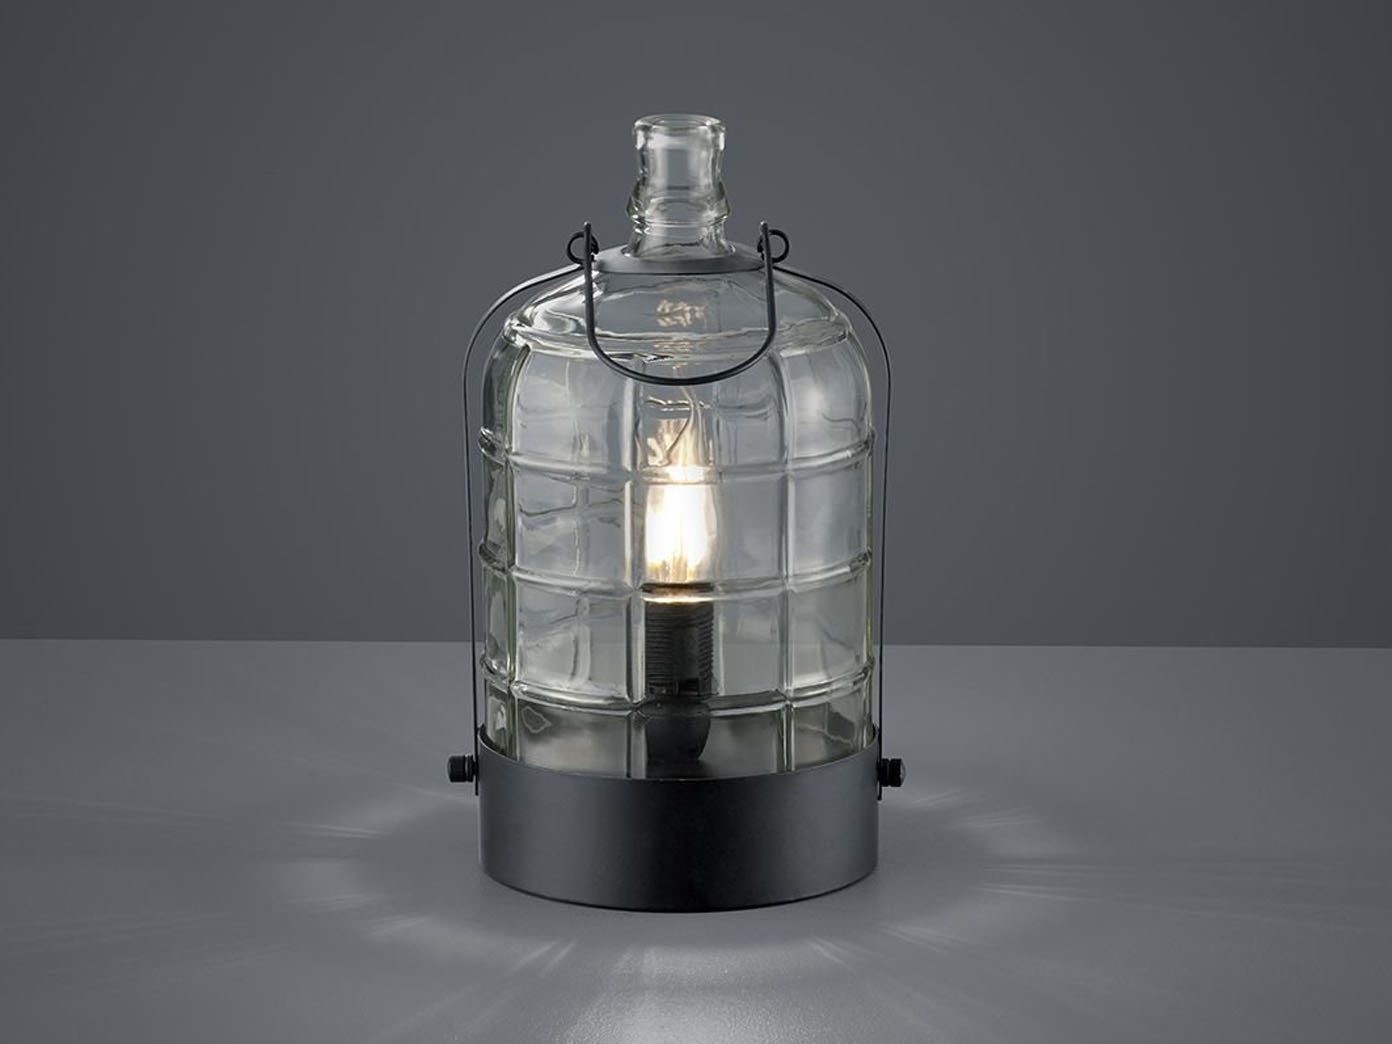 kleine led tischlampe retro stil tischleuchte glas. Black Bedroom Furniture Sets. Home Design Ideas